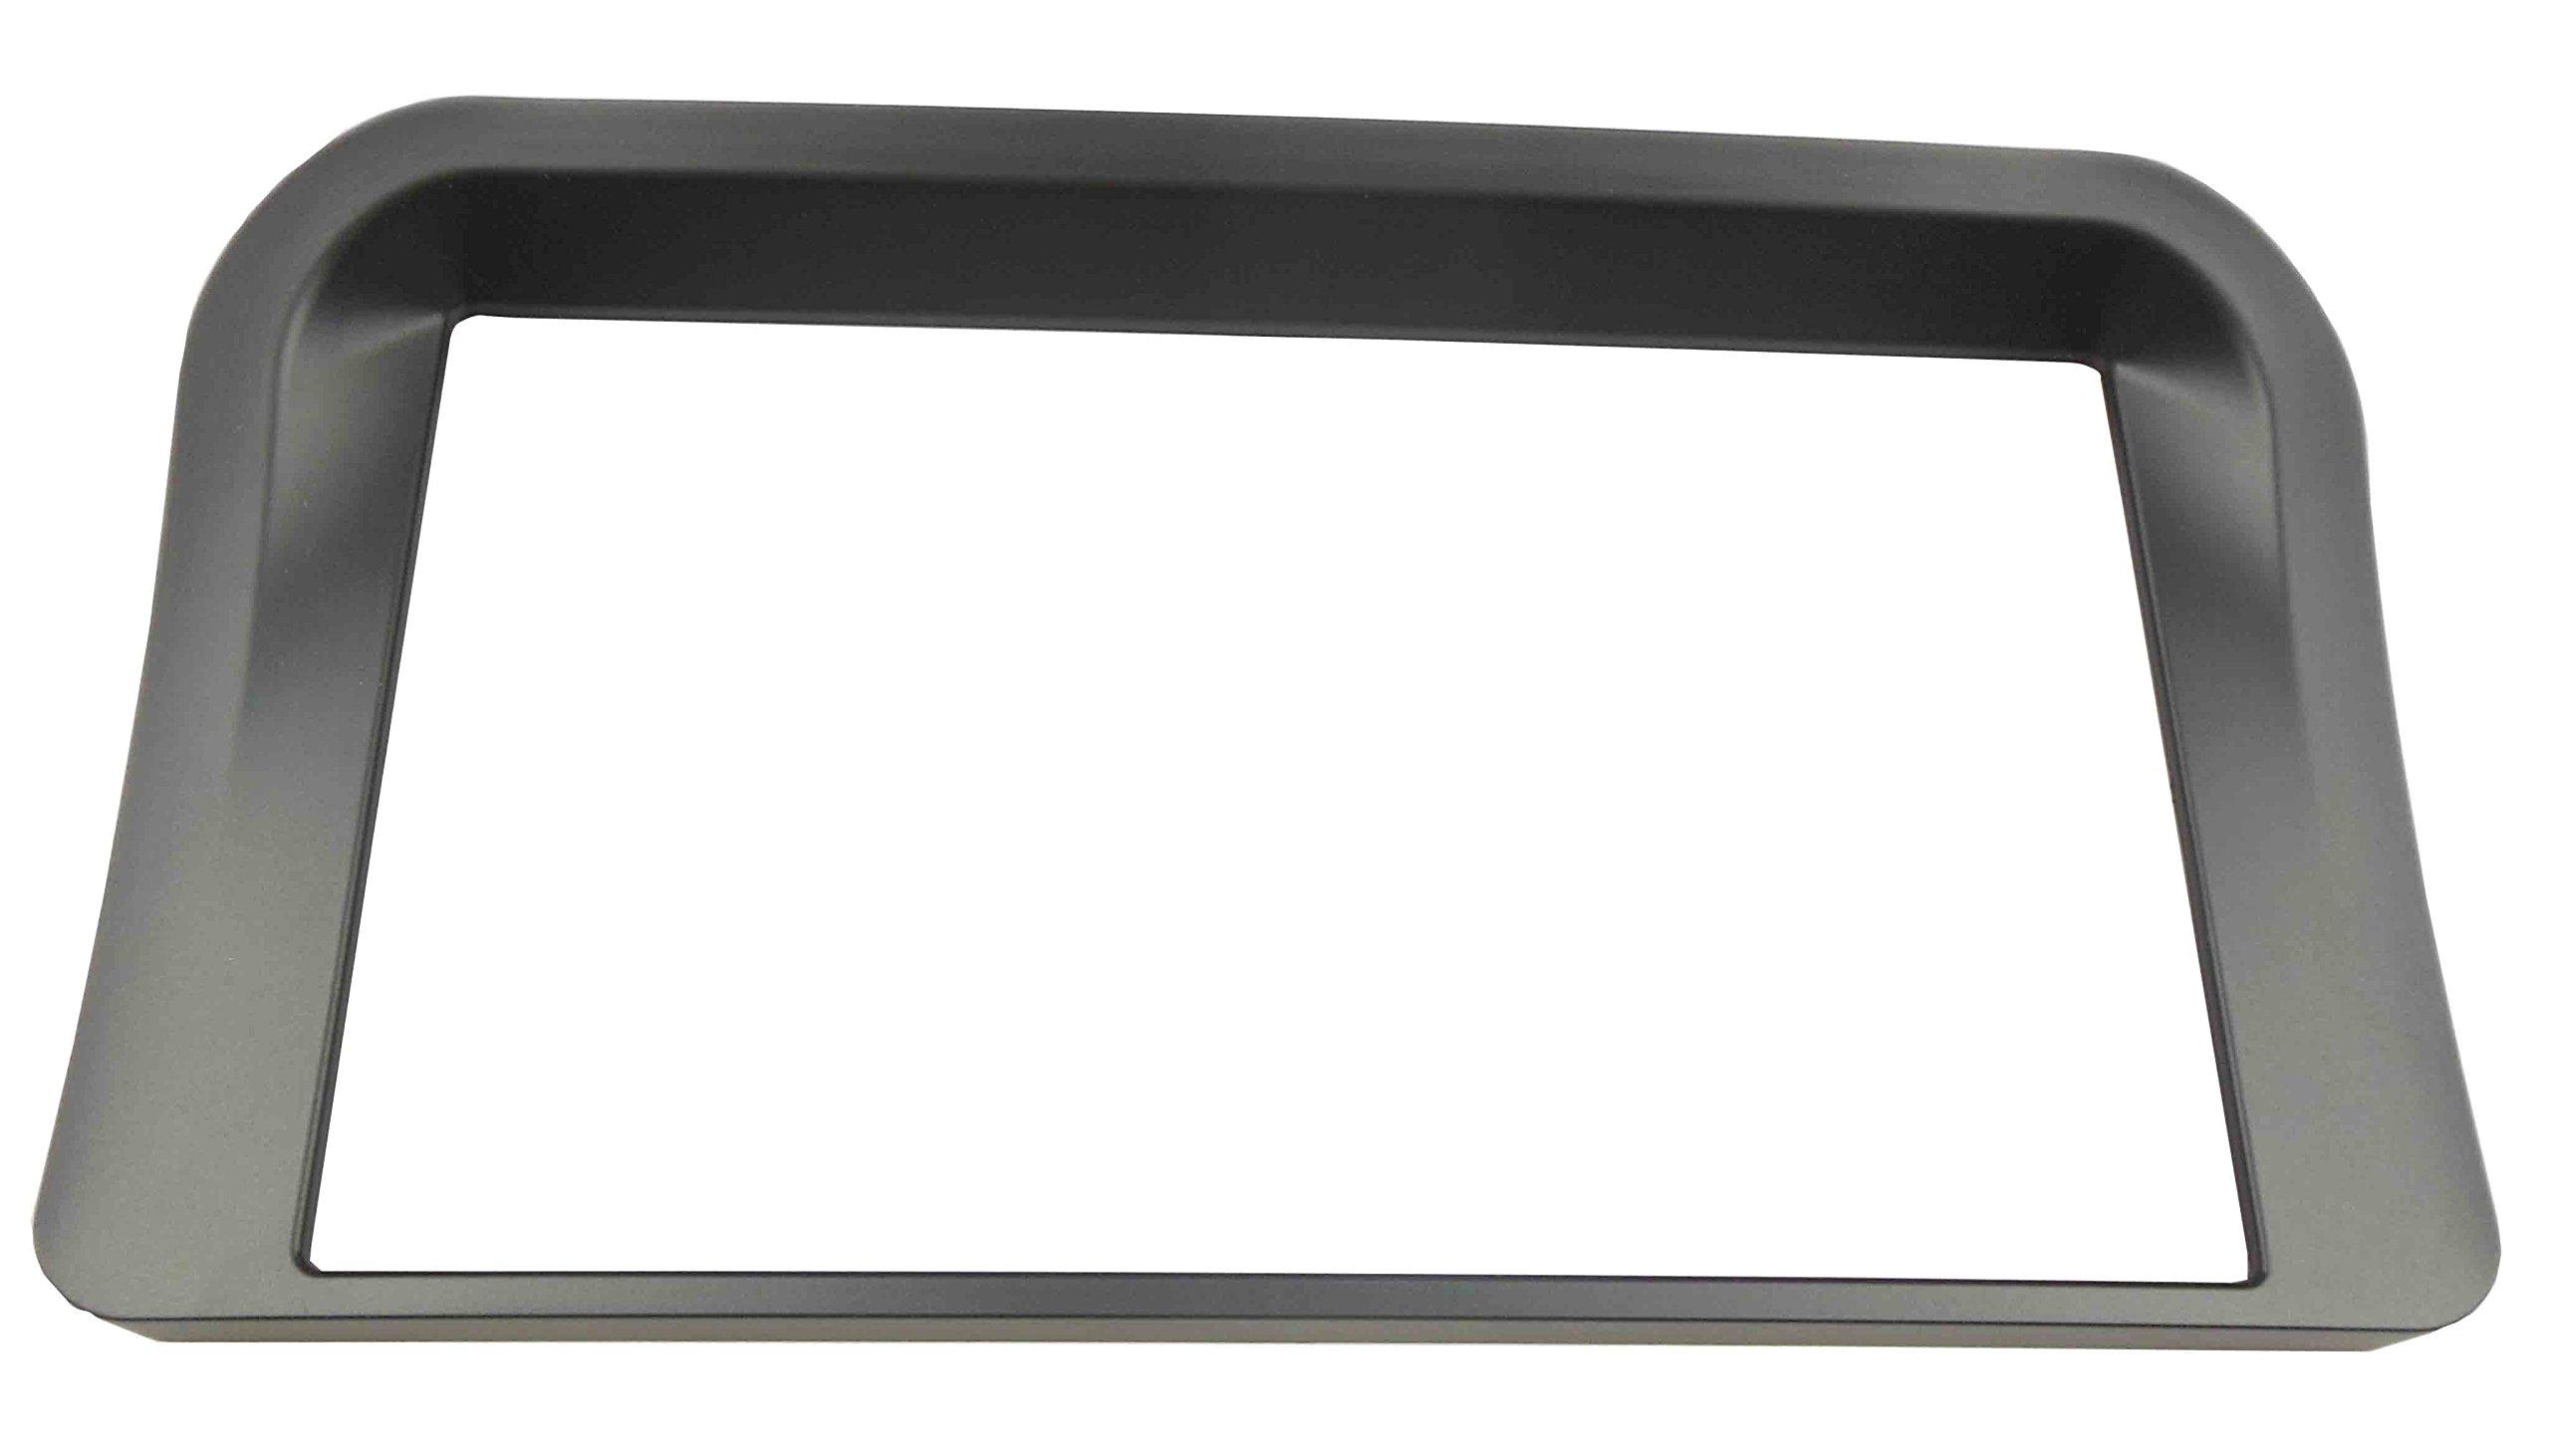 DKMUS Double Din Radio DVD Stereo Frame for Lexus Lx-470 2002-2008 Toyota Lc-100 1998-2003 Dash Trim Kit Fascia Inner Size 173*98mm Black